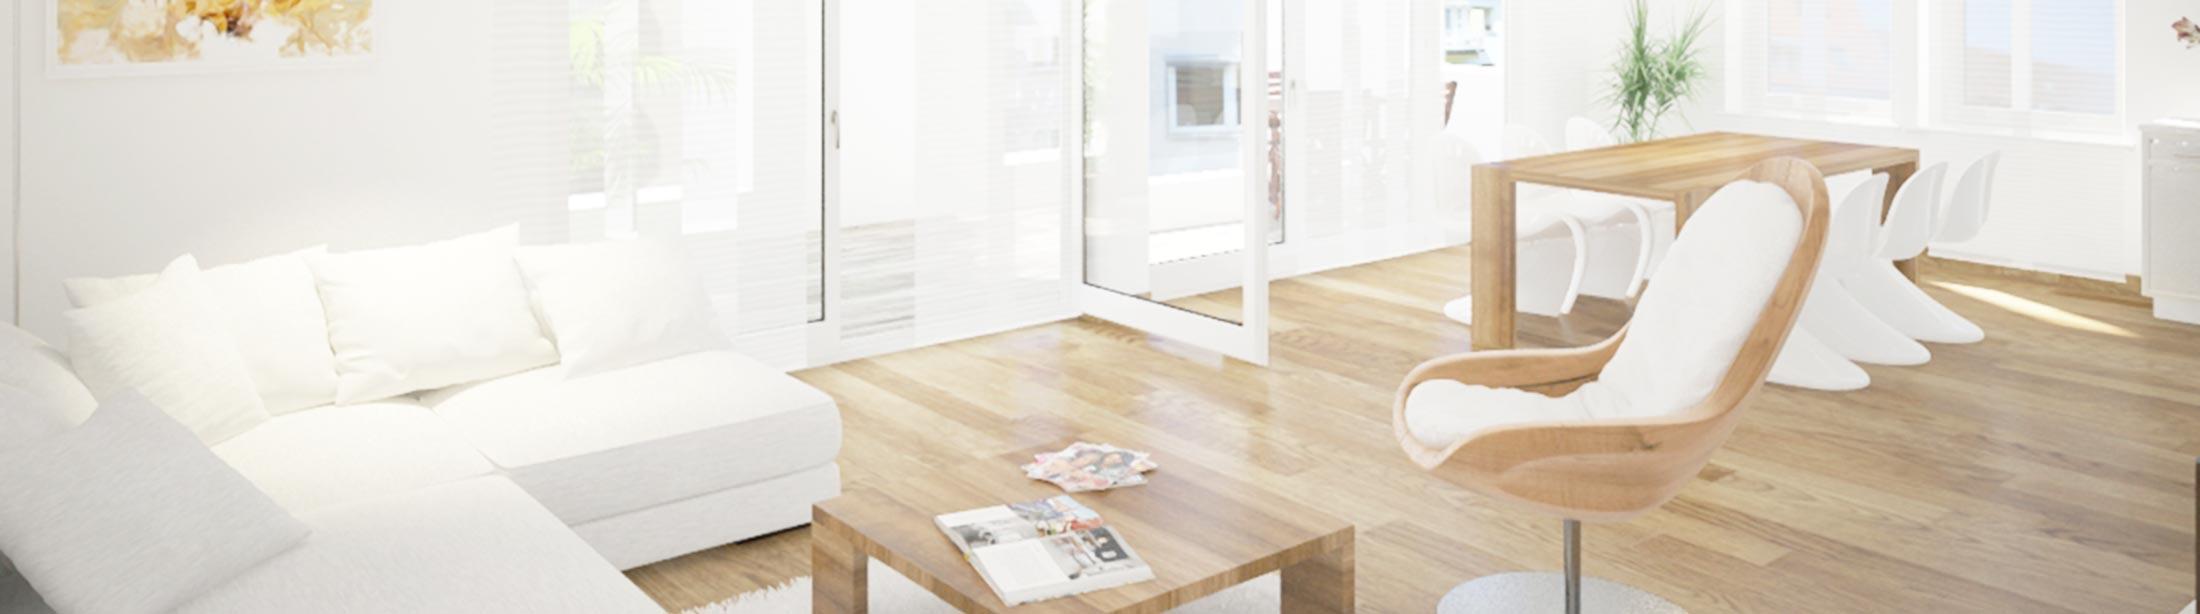 immobilien vermarktung ludwigsburg immobilienwert. Black Bedroom Furniture Sets. Home Design Ideas